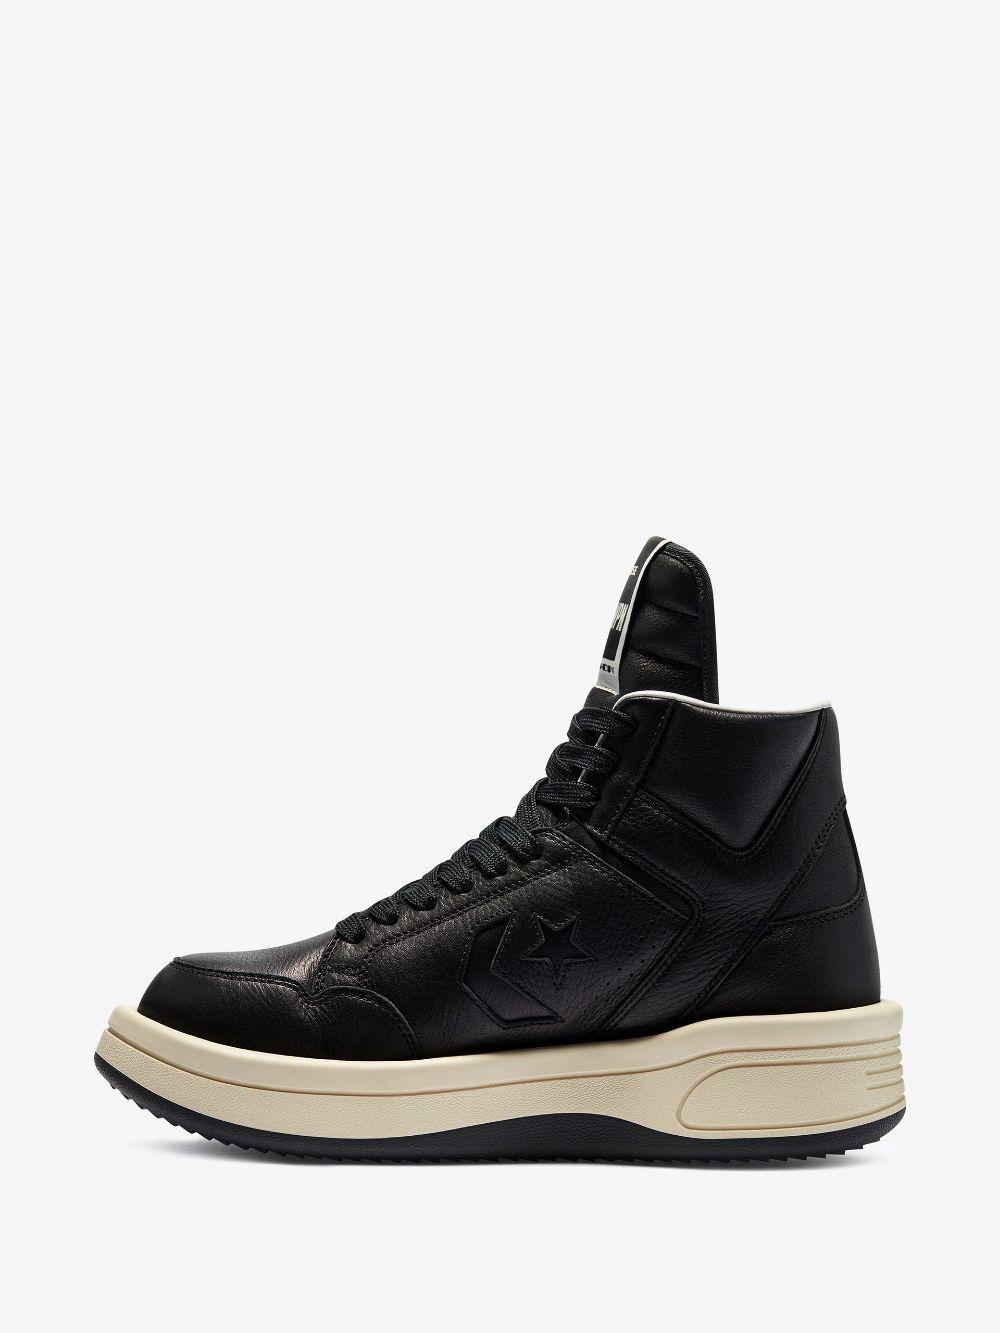 sneakers turbowpn uomo nere in pelle CONVERSE X DRKSHDW | Sneakers | DC02AX515 SA5R291